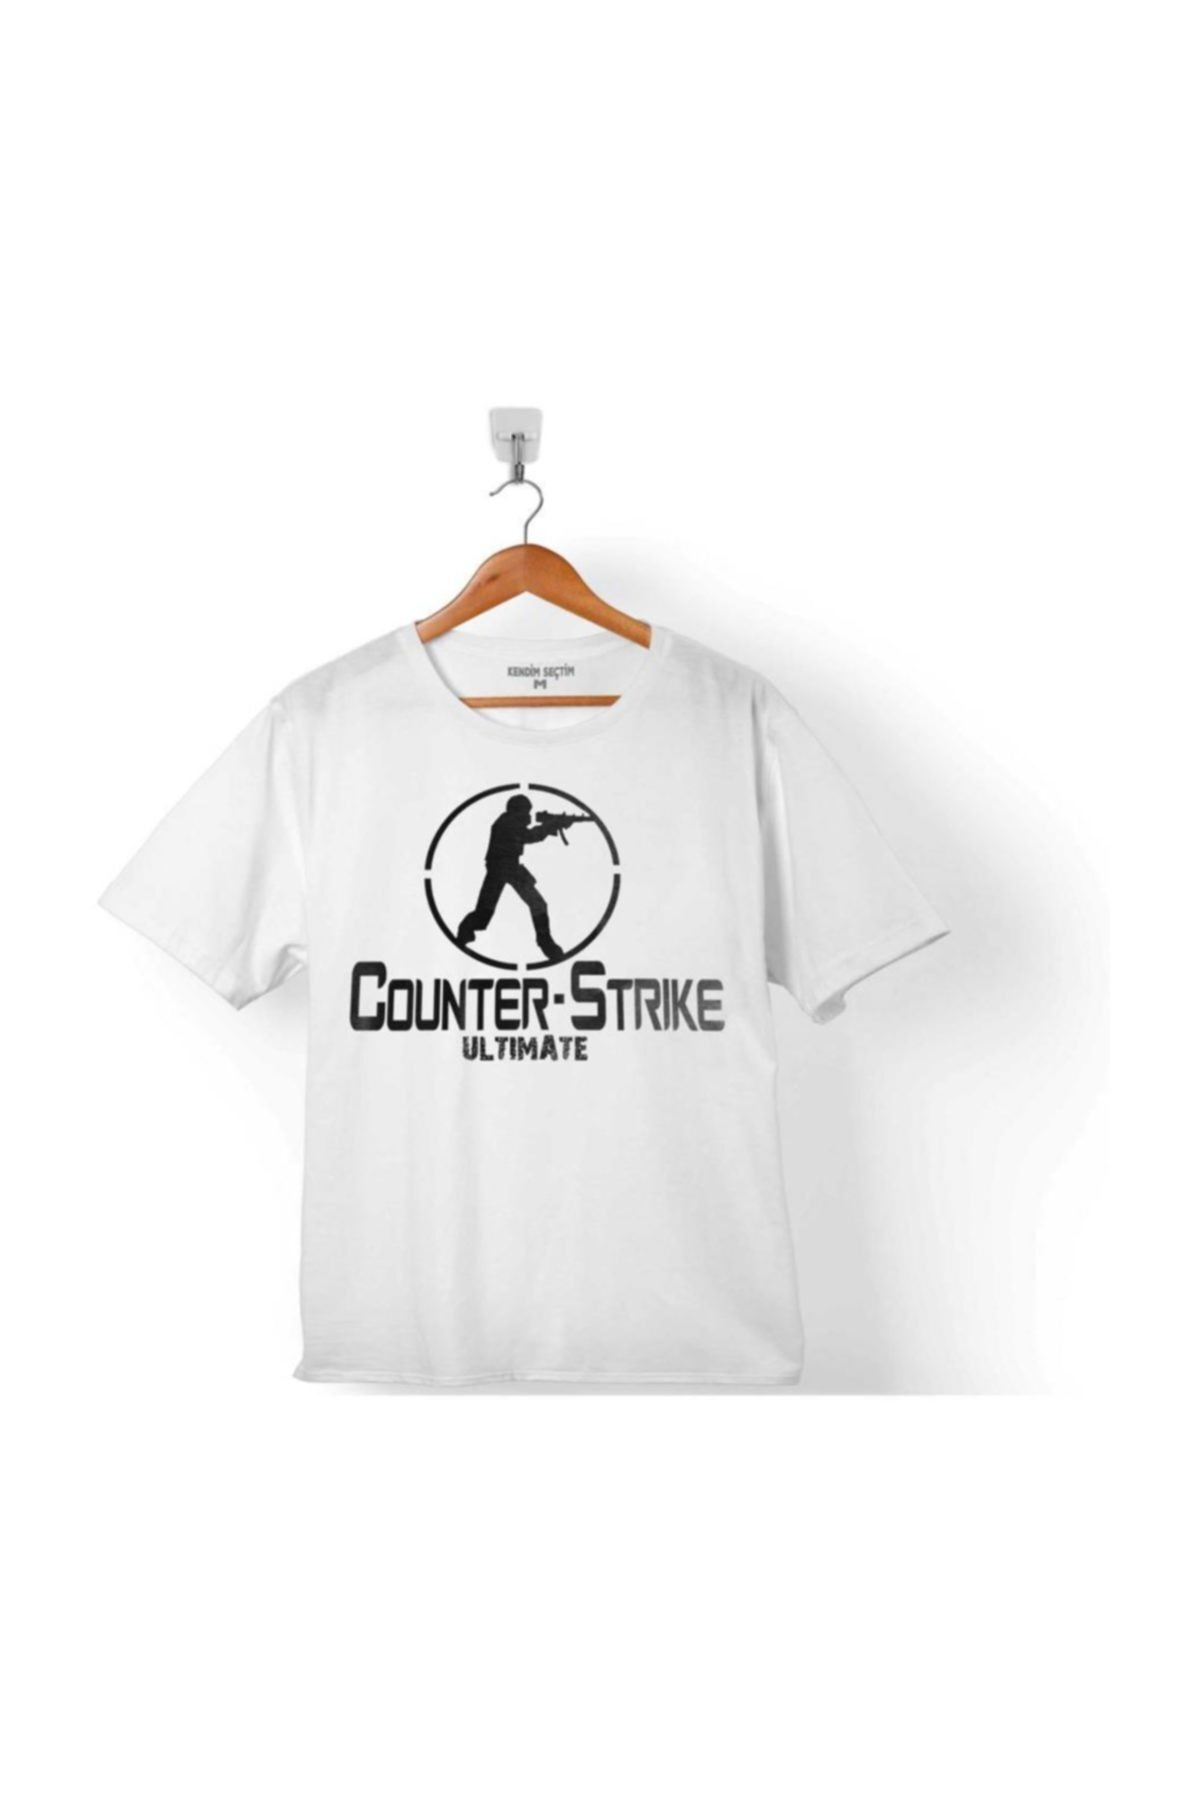 Kendim Seçtim Counter Strıke Cs Go Ultımate Gamer Oyuncu Çocuk Tişört 1